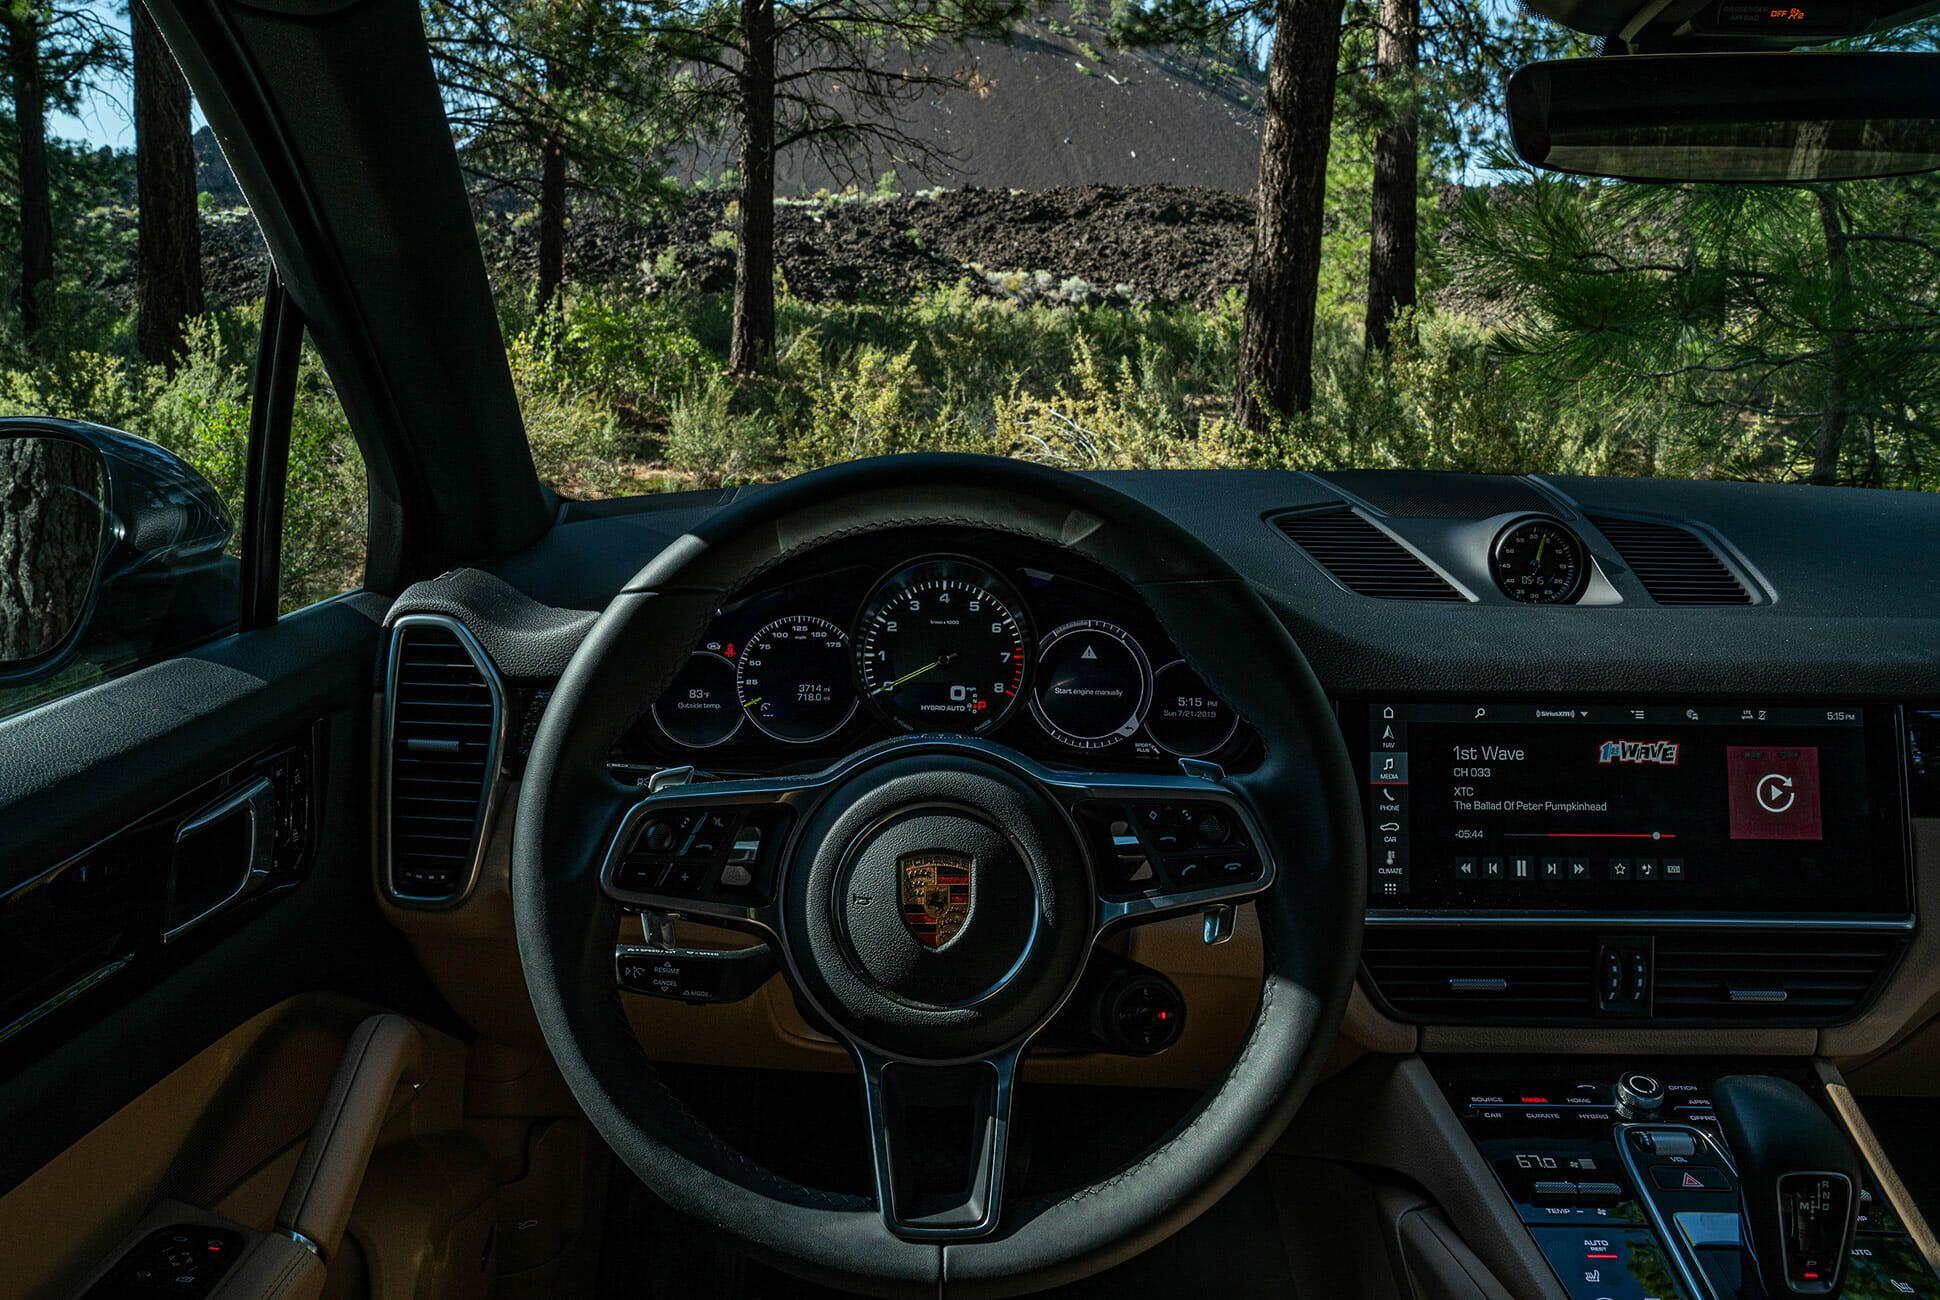 Pair-of-High-Tech-Porsche-Cayenne-Hybrids-gear-patrol-Lava-ambience-2